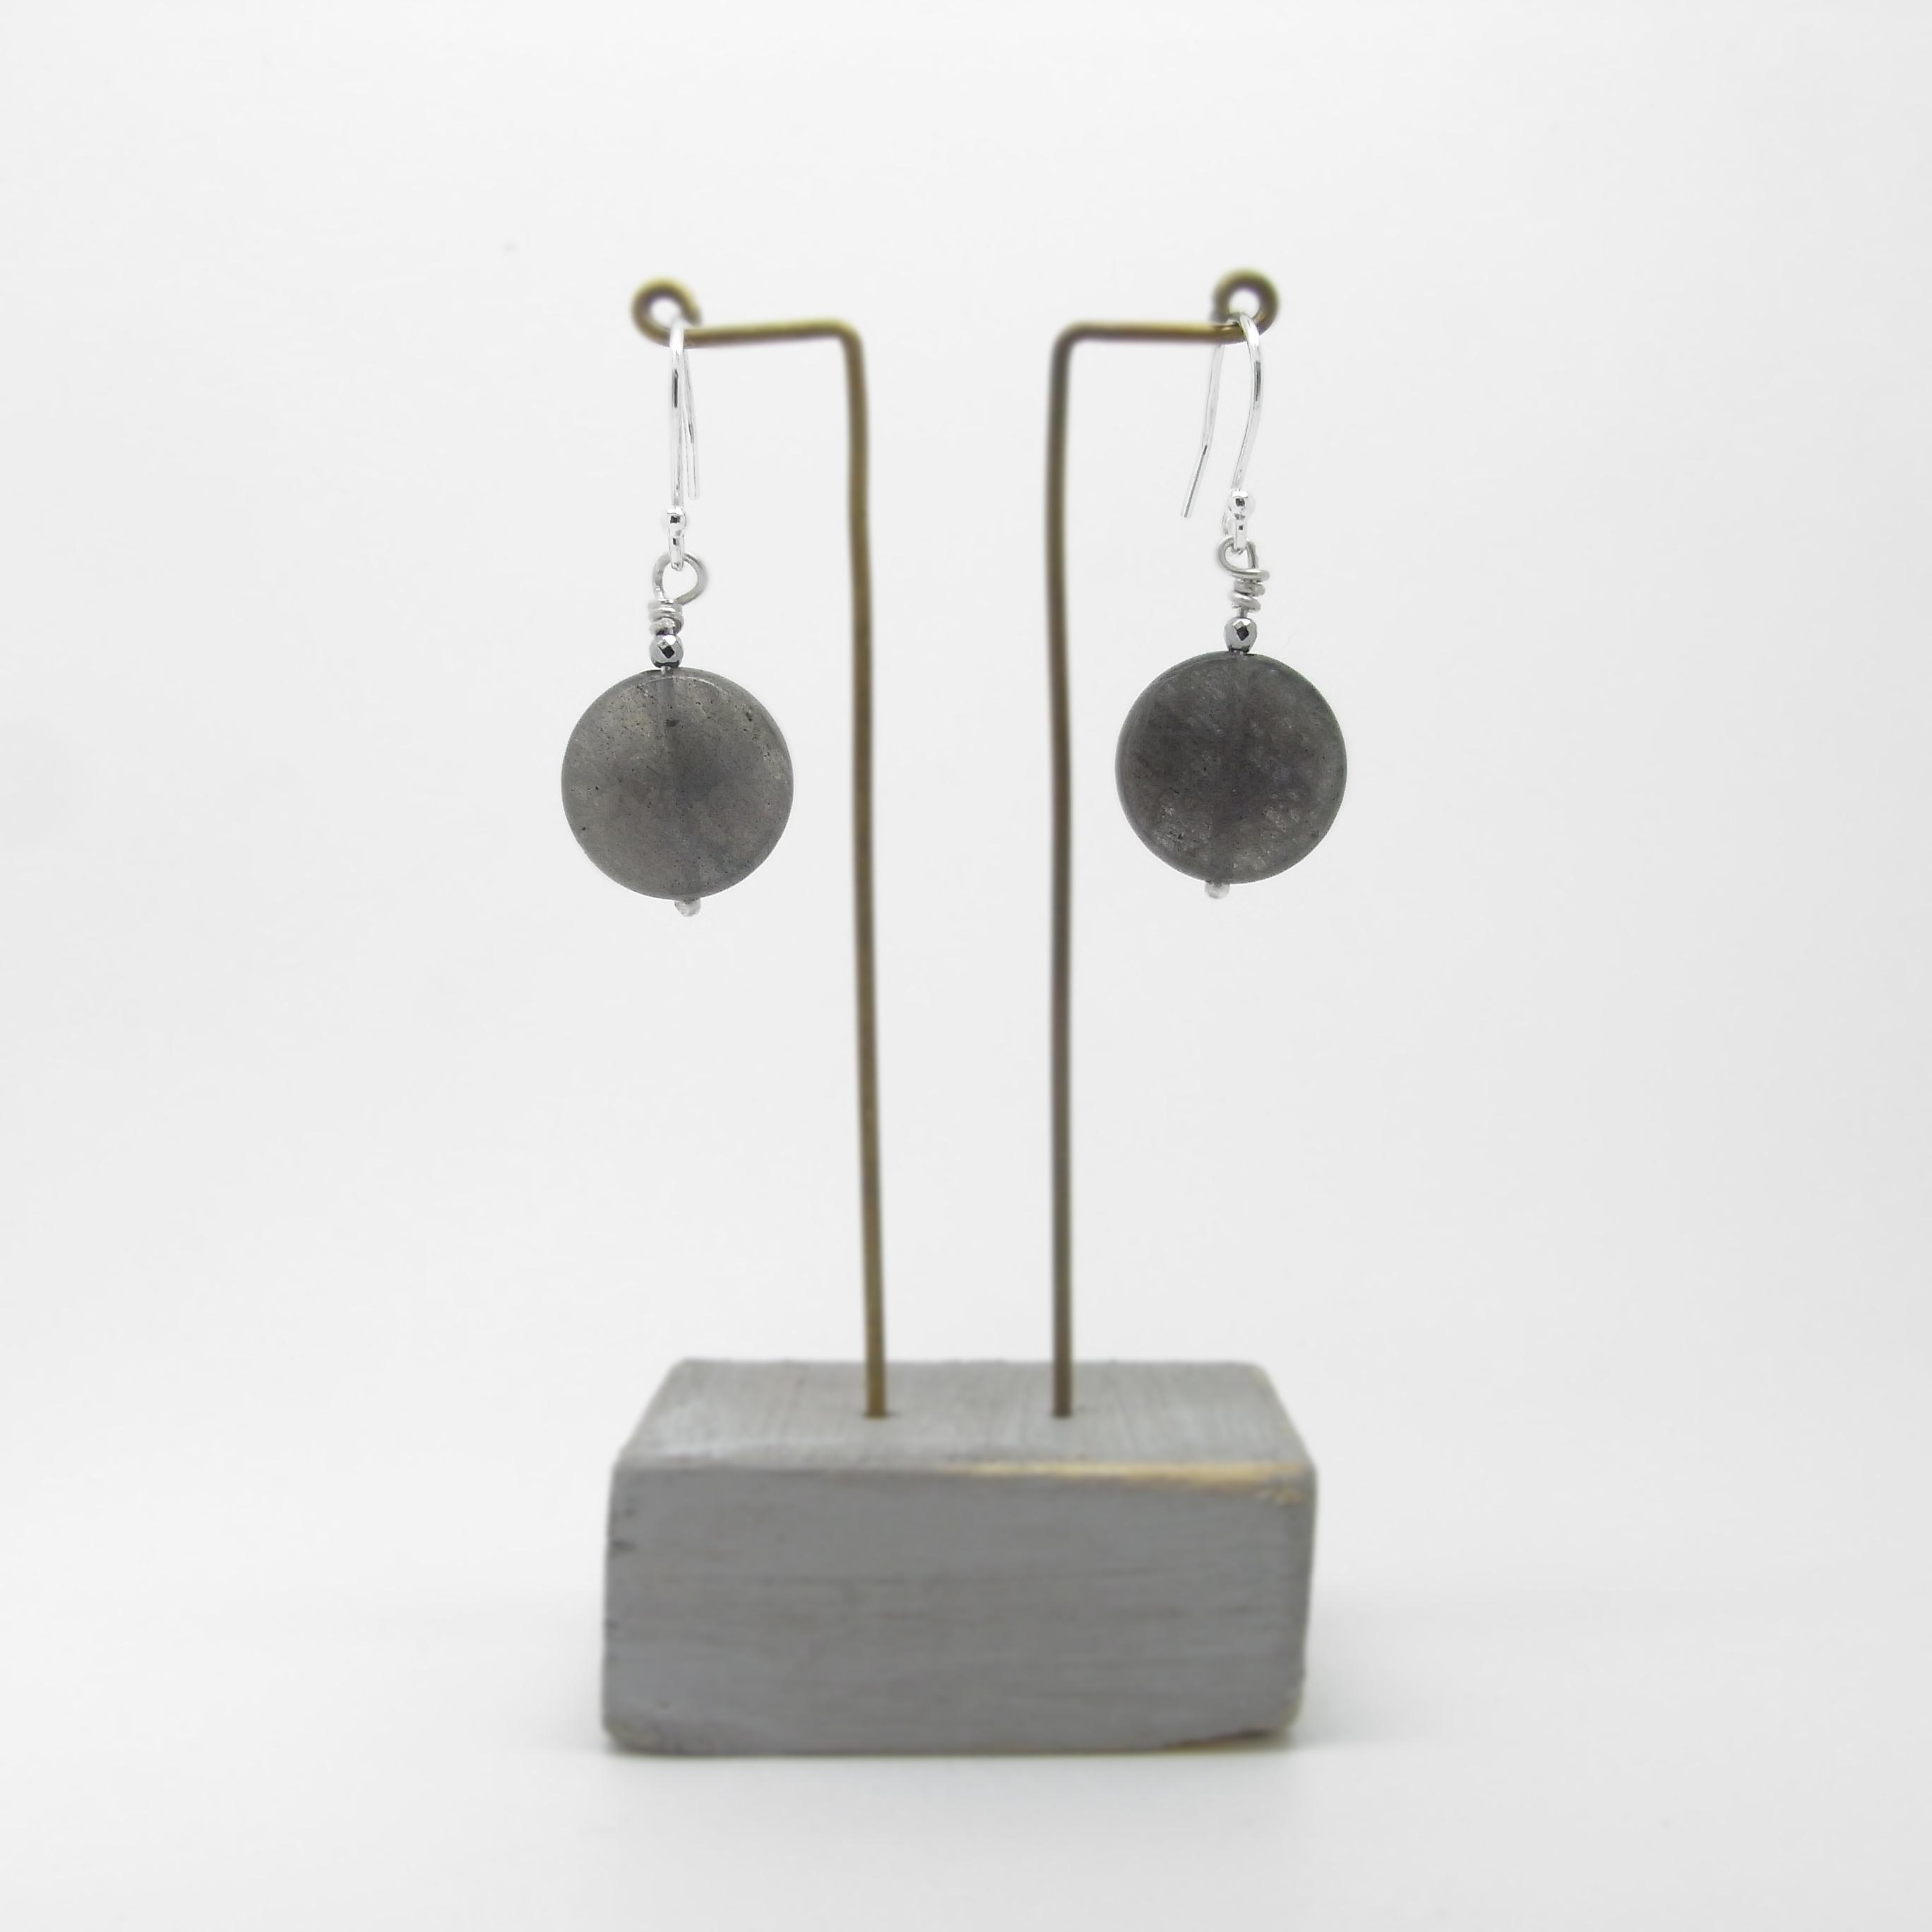 SALE - Labradorite Earrings - Round